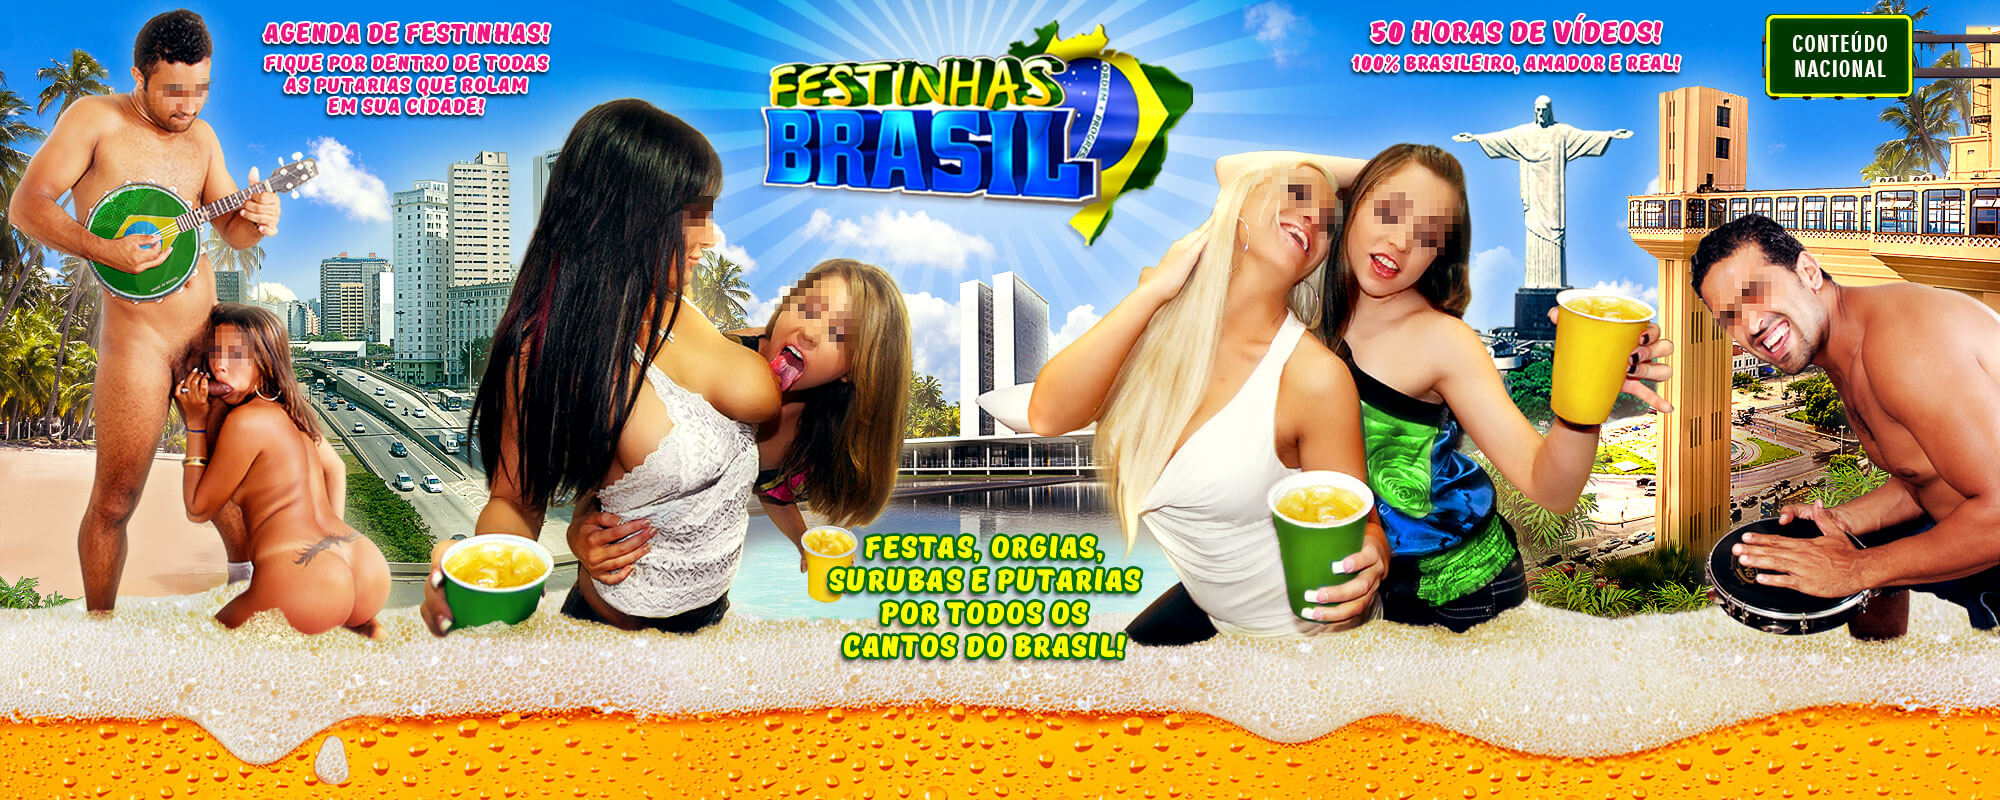 sexo do brasil